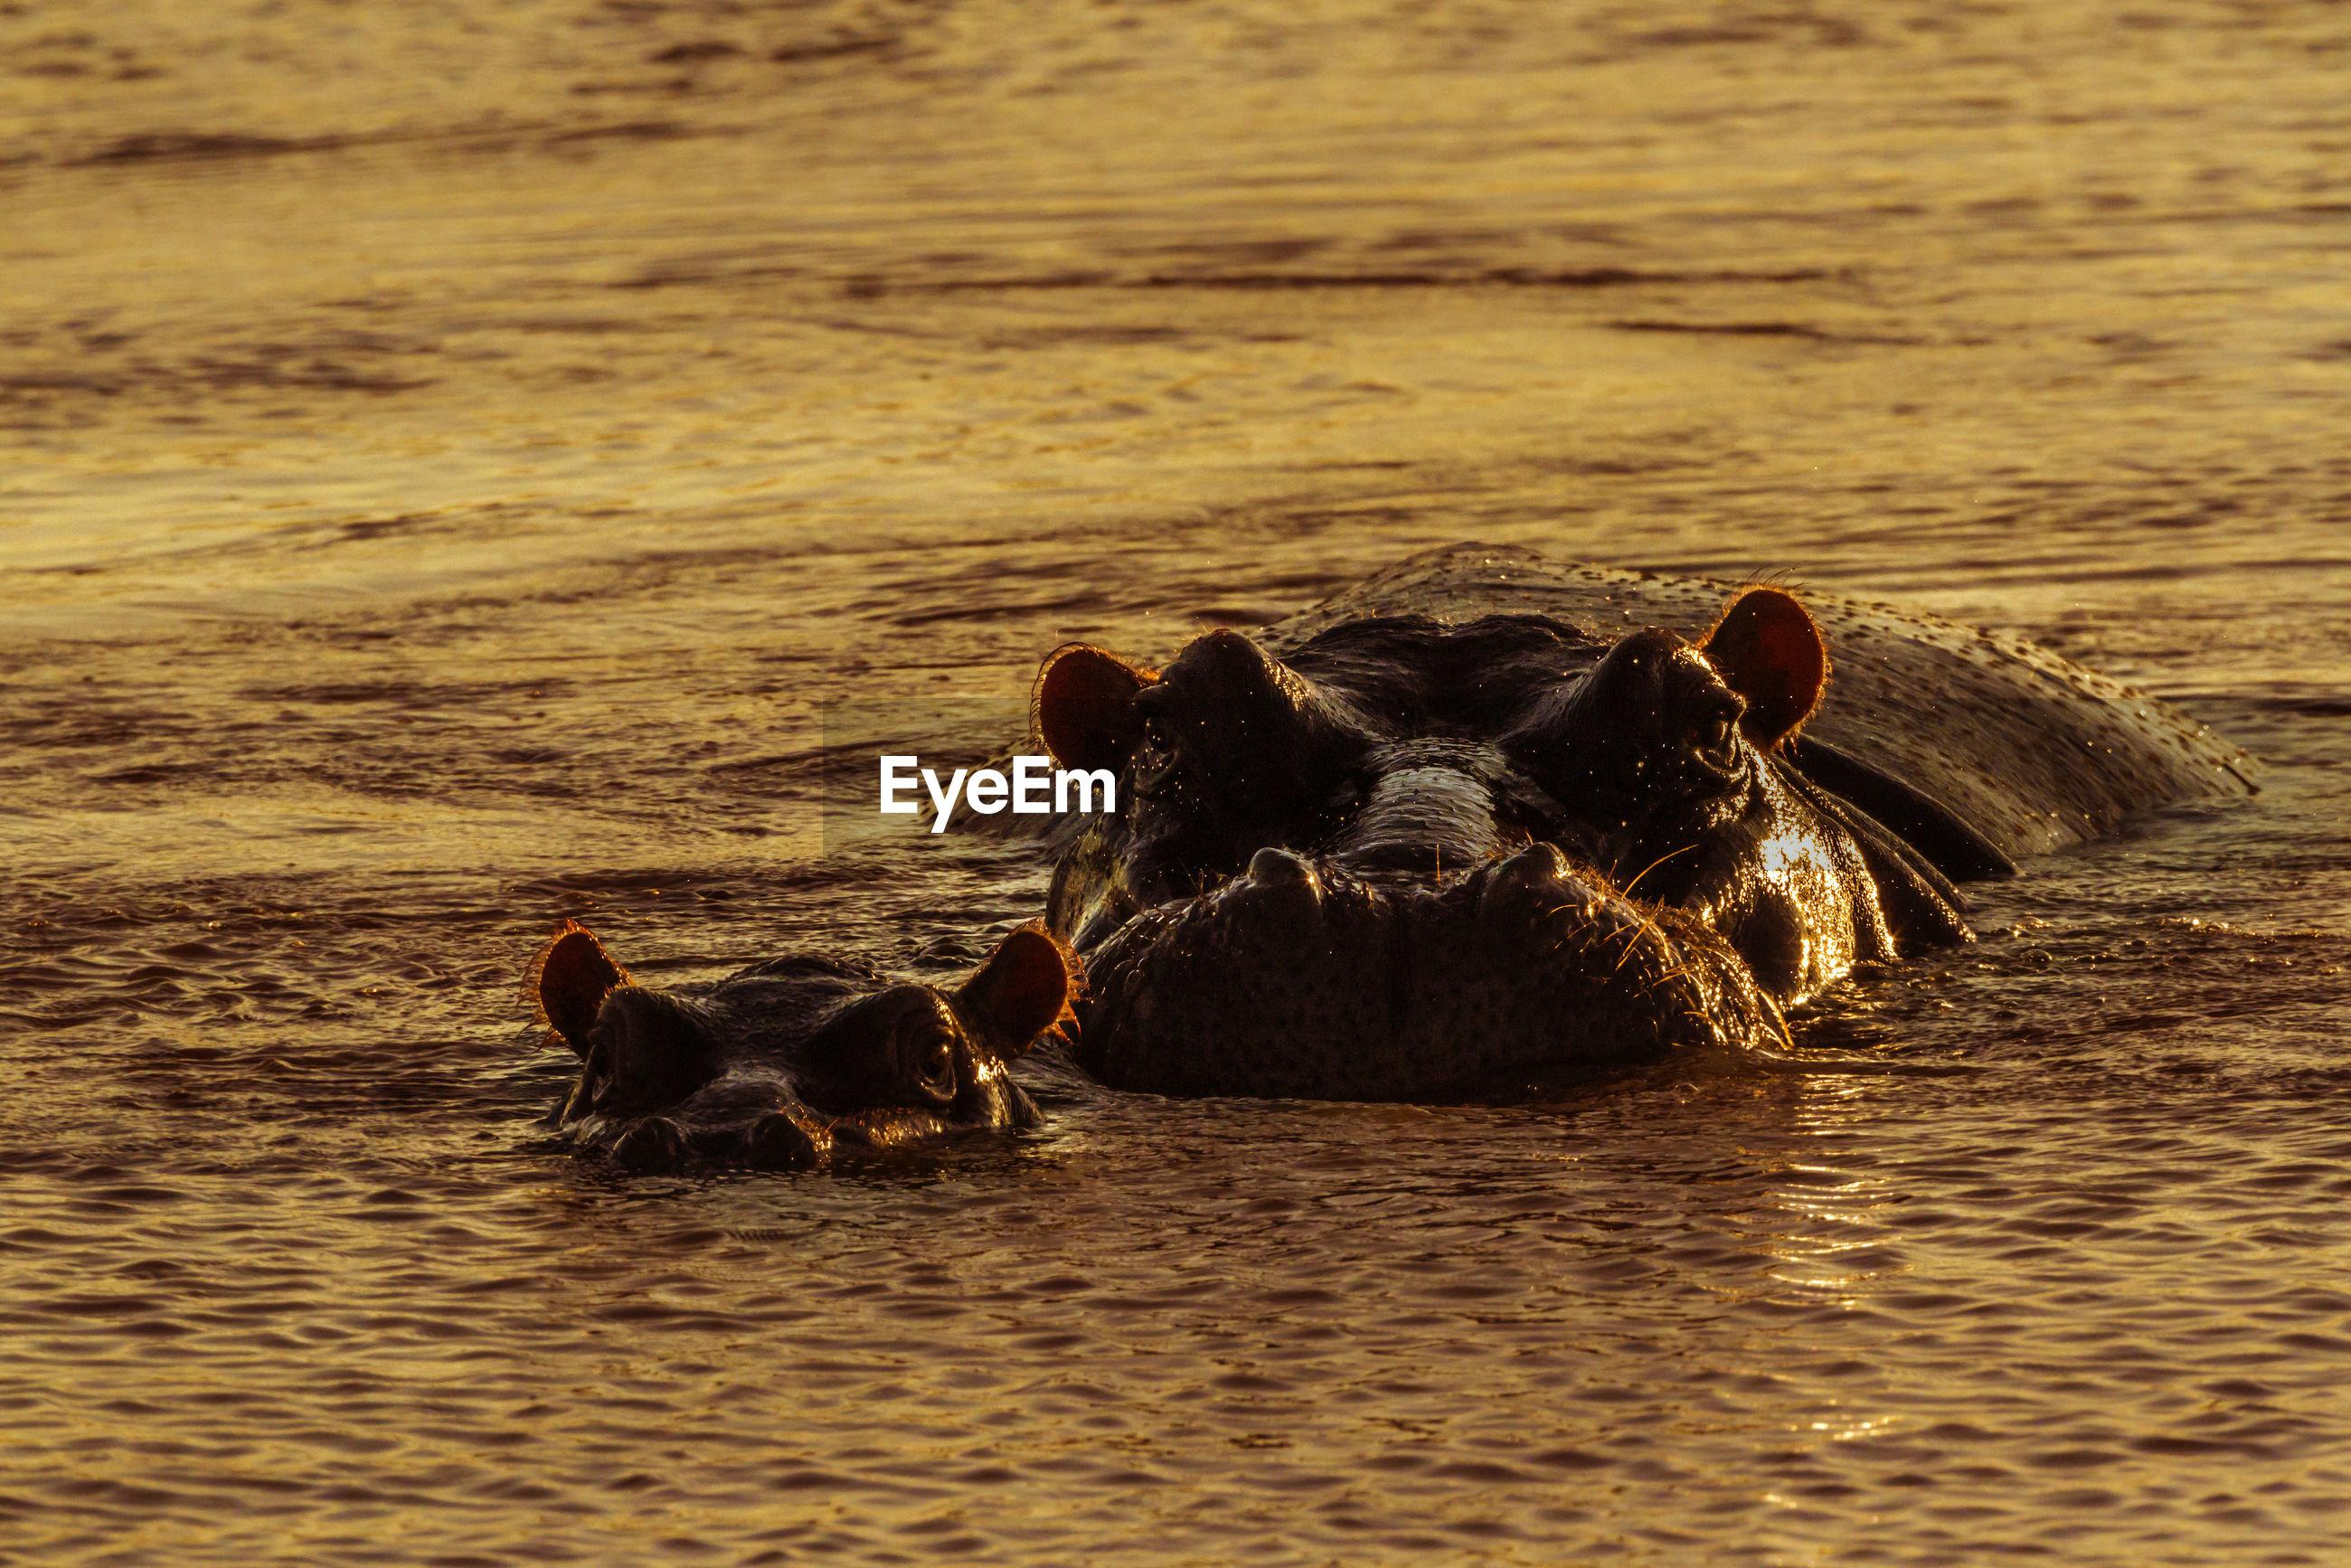 Hippopotamus with calf in river